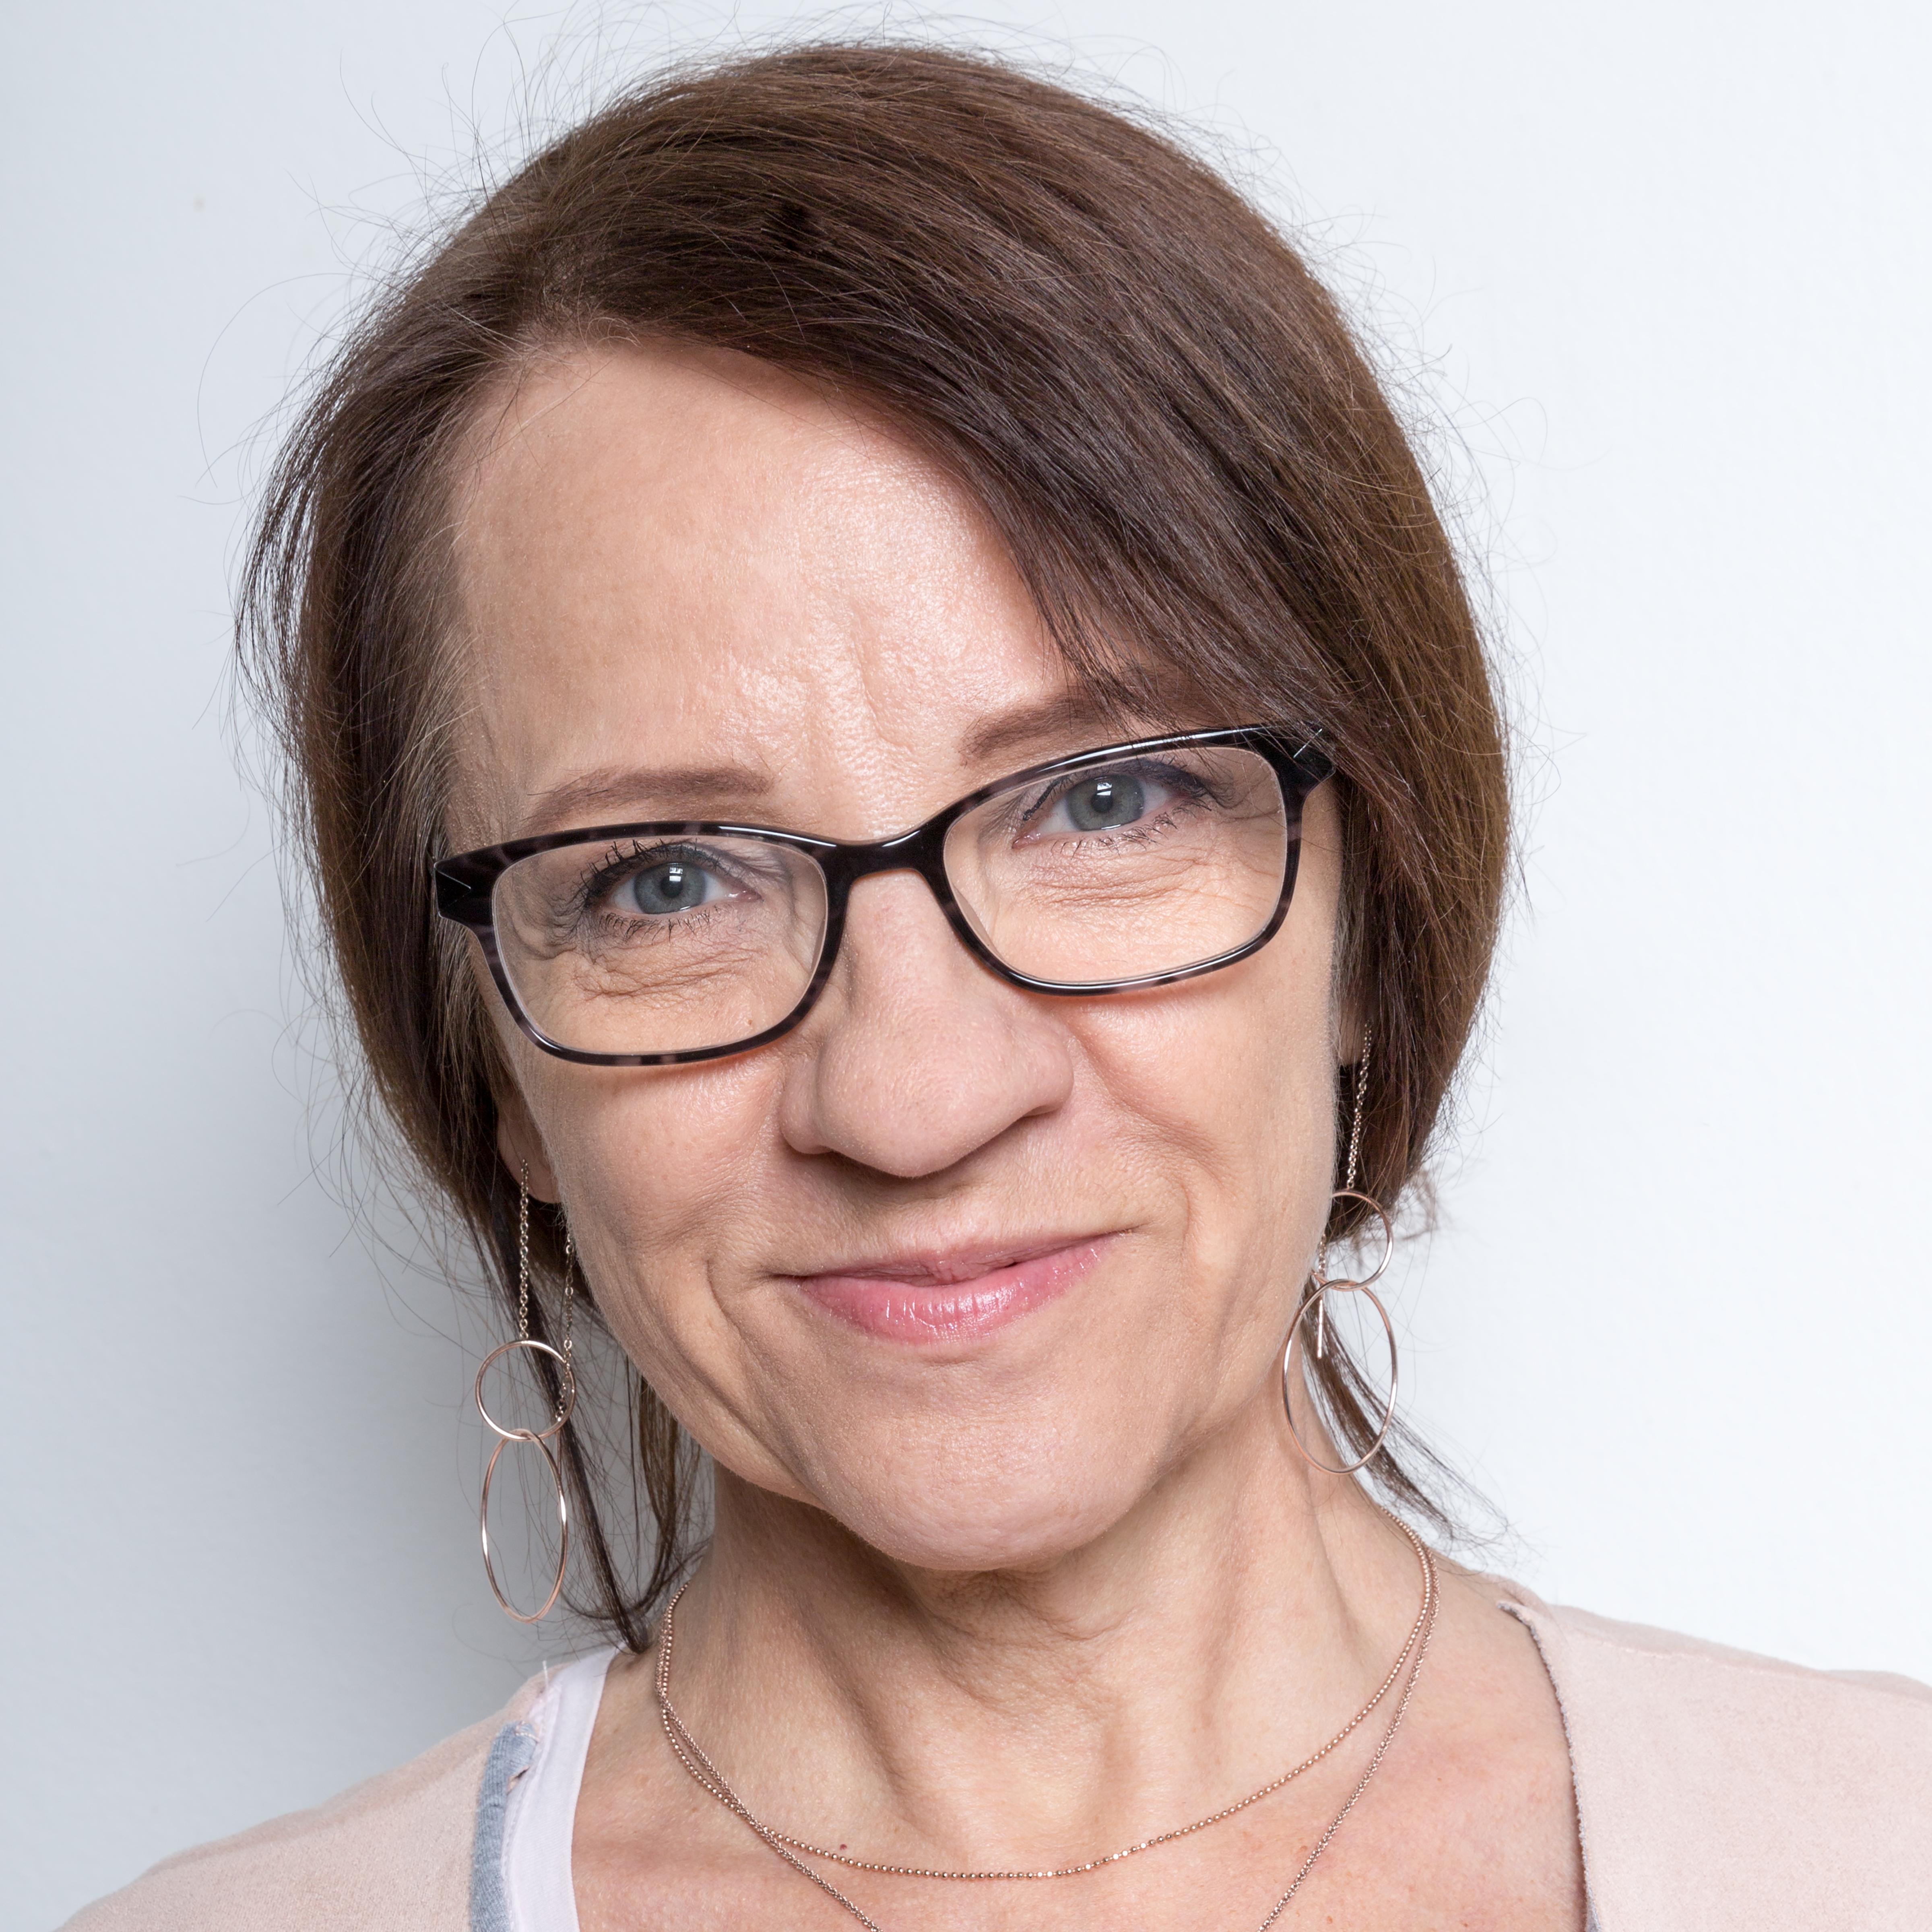 Elzbieta Gebicki